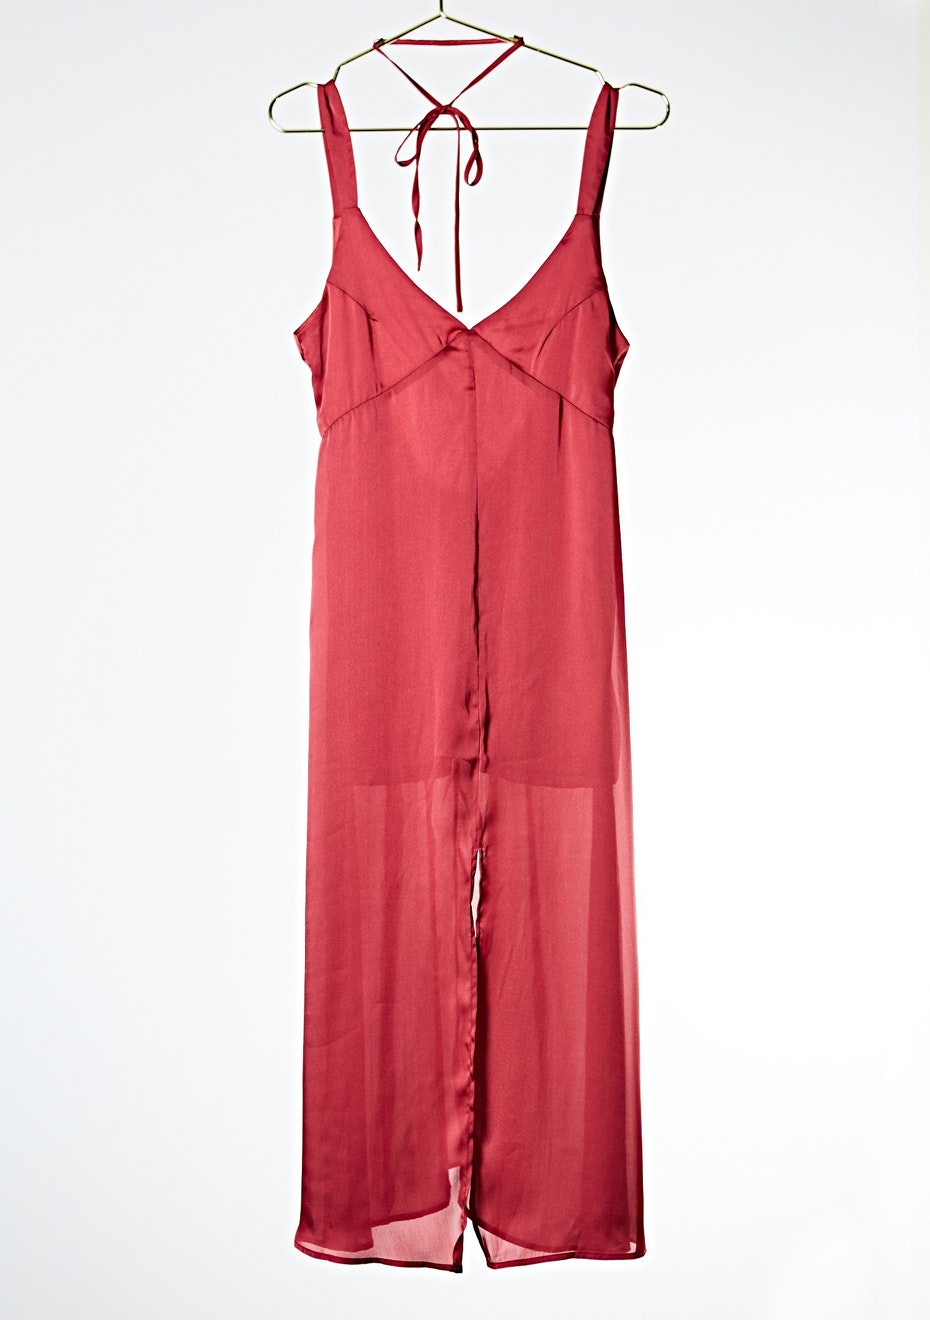 GIGI FLARED DRESS - TULIP